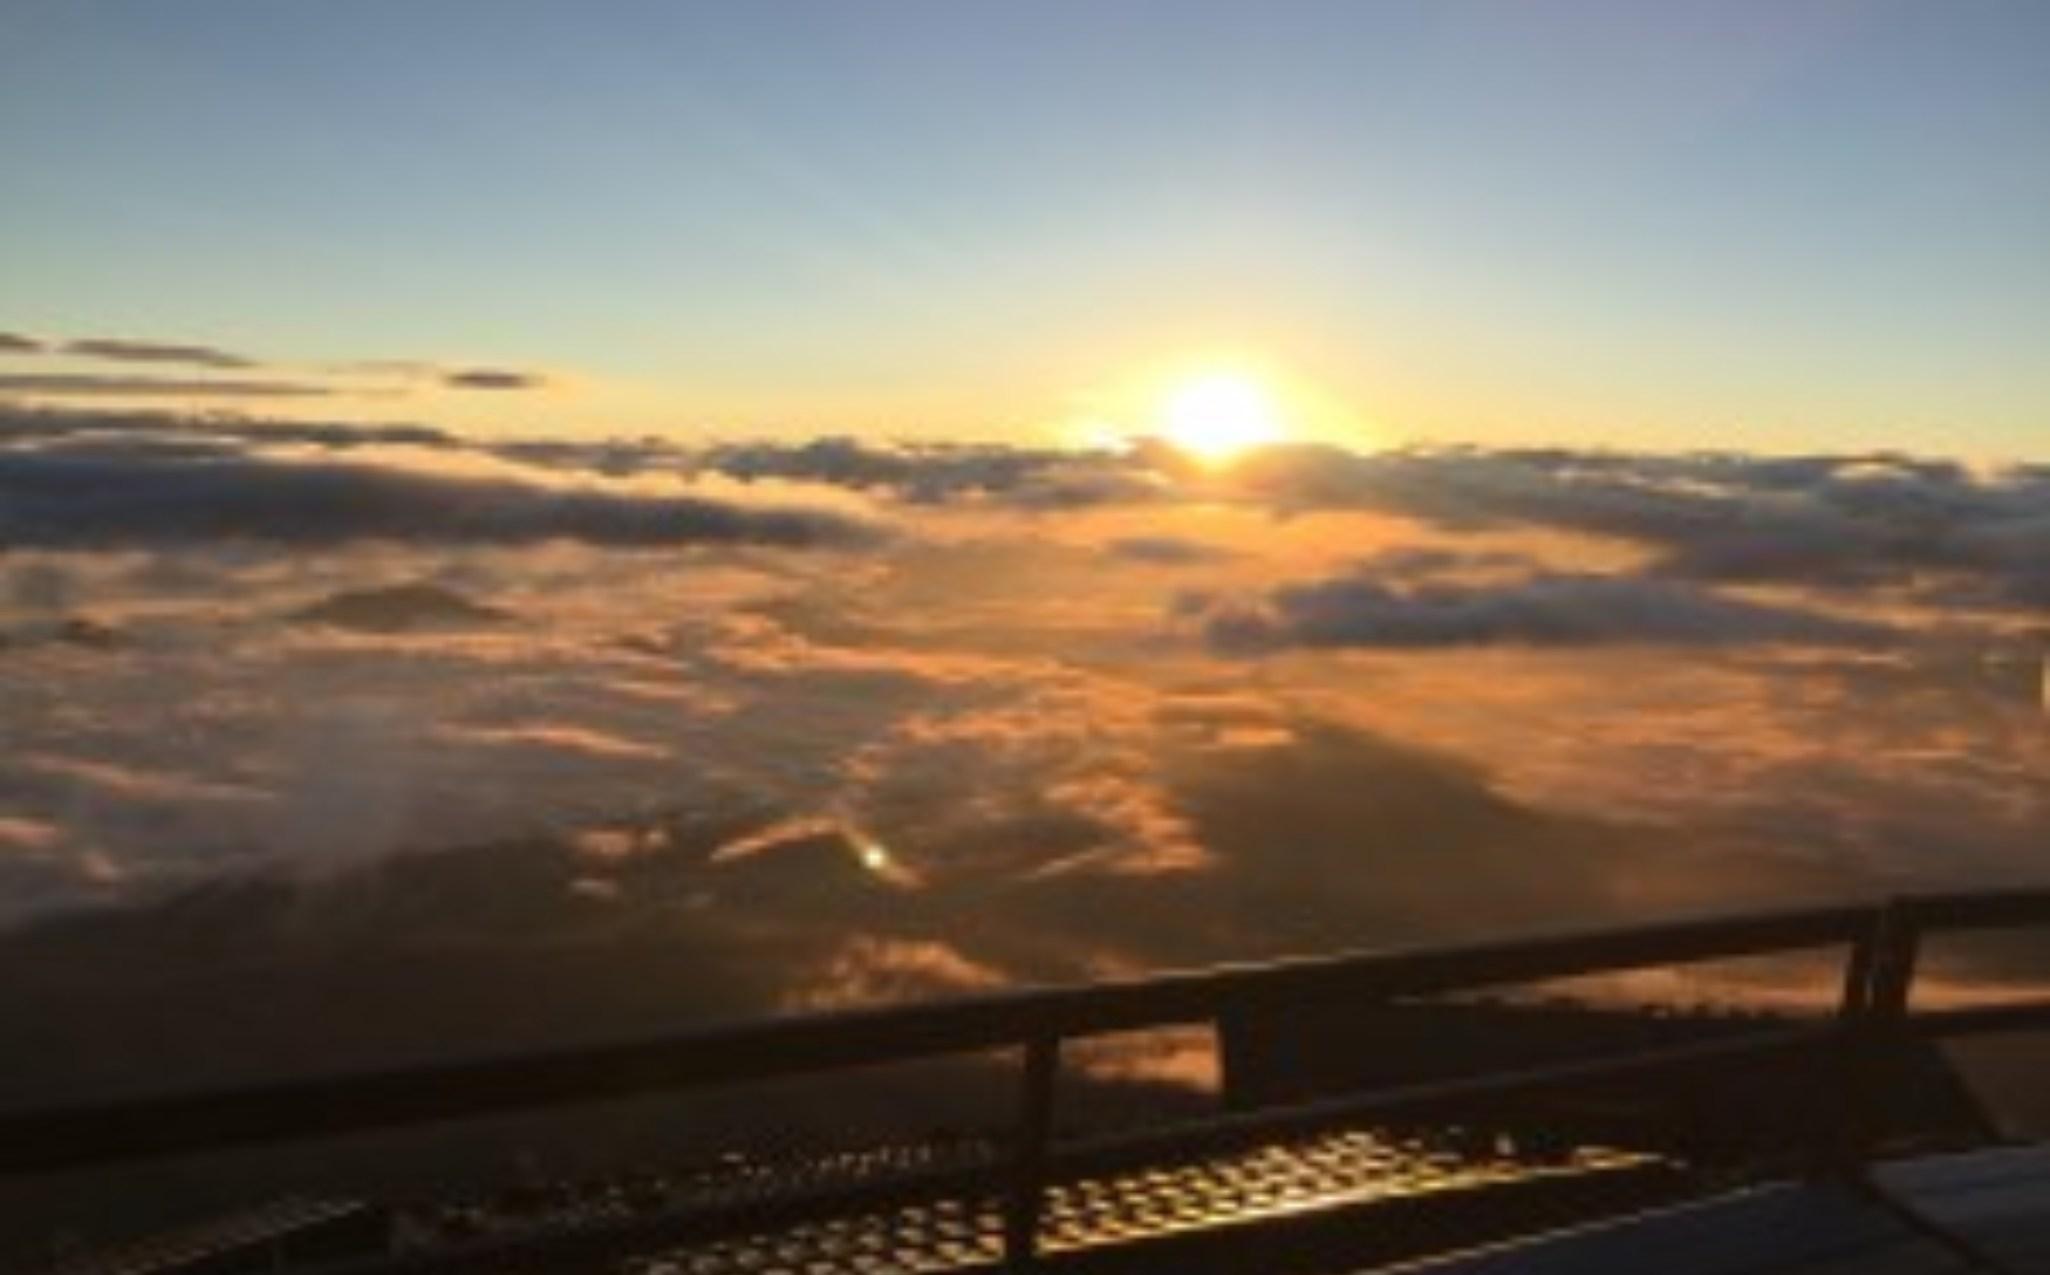 Mt Fuji Outlook Sunrise